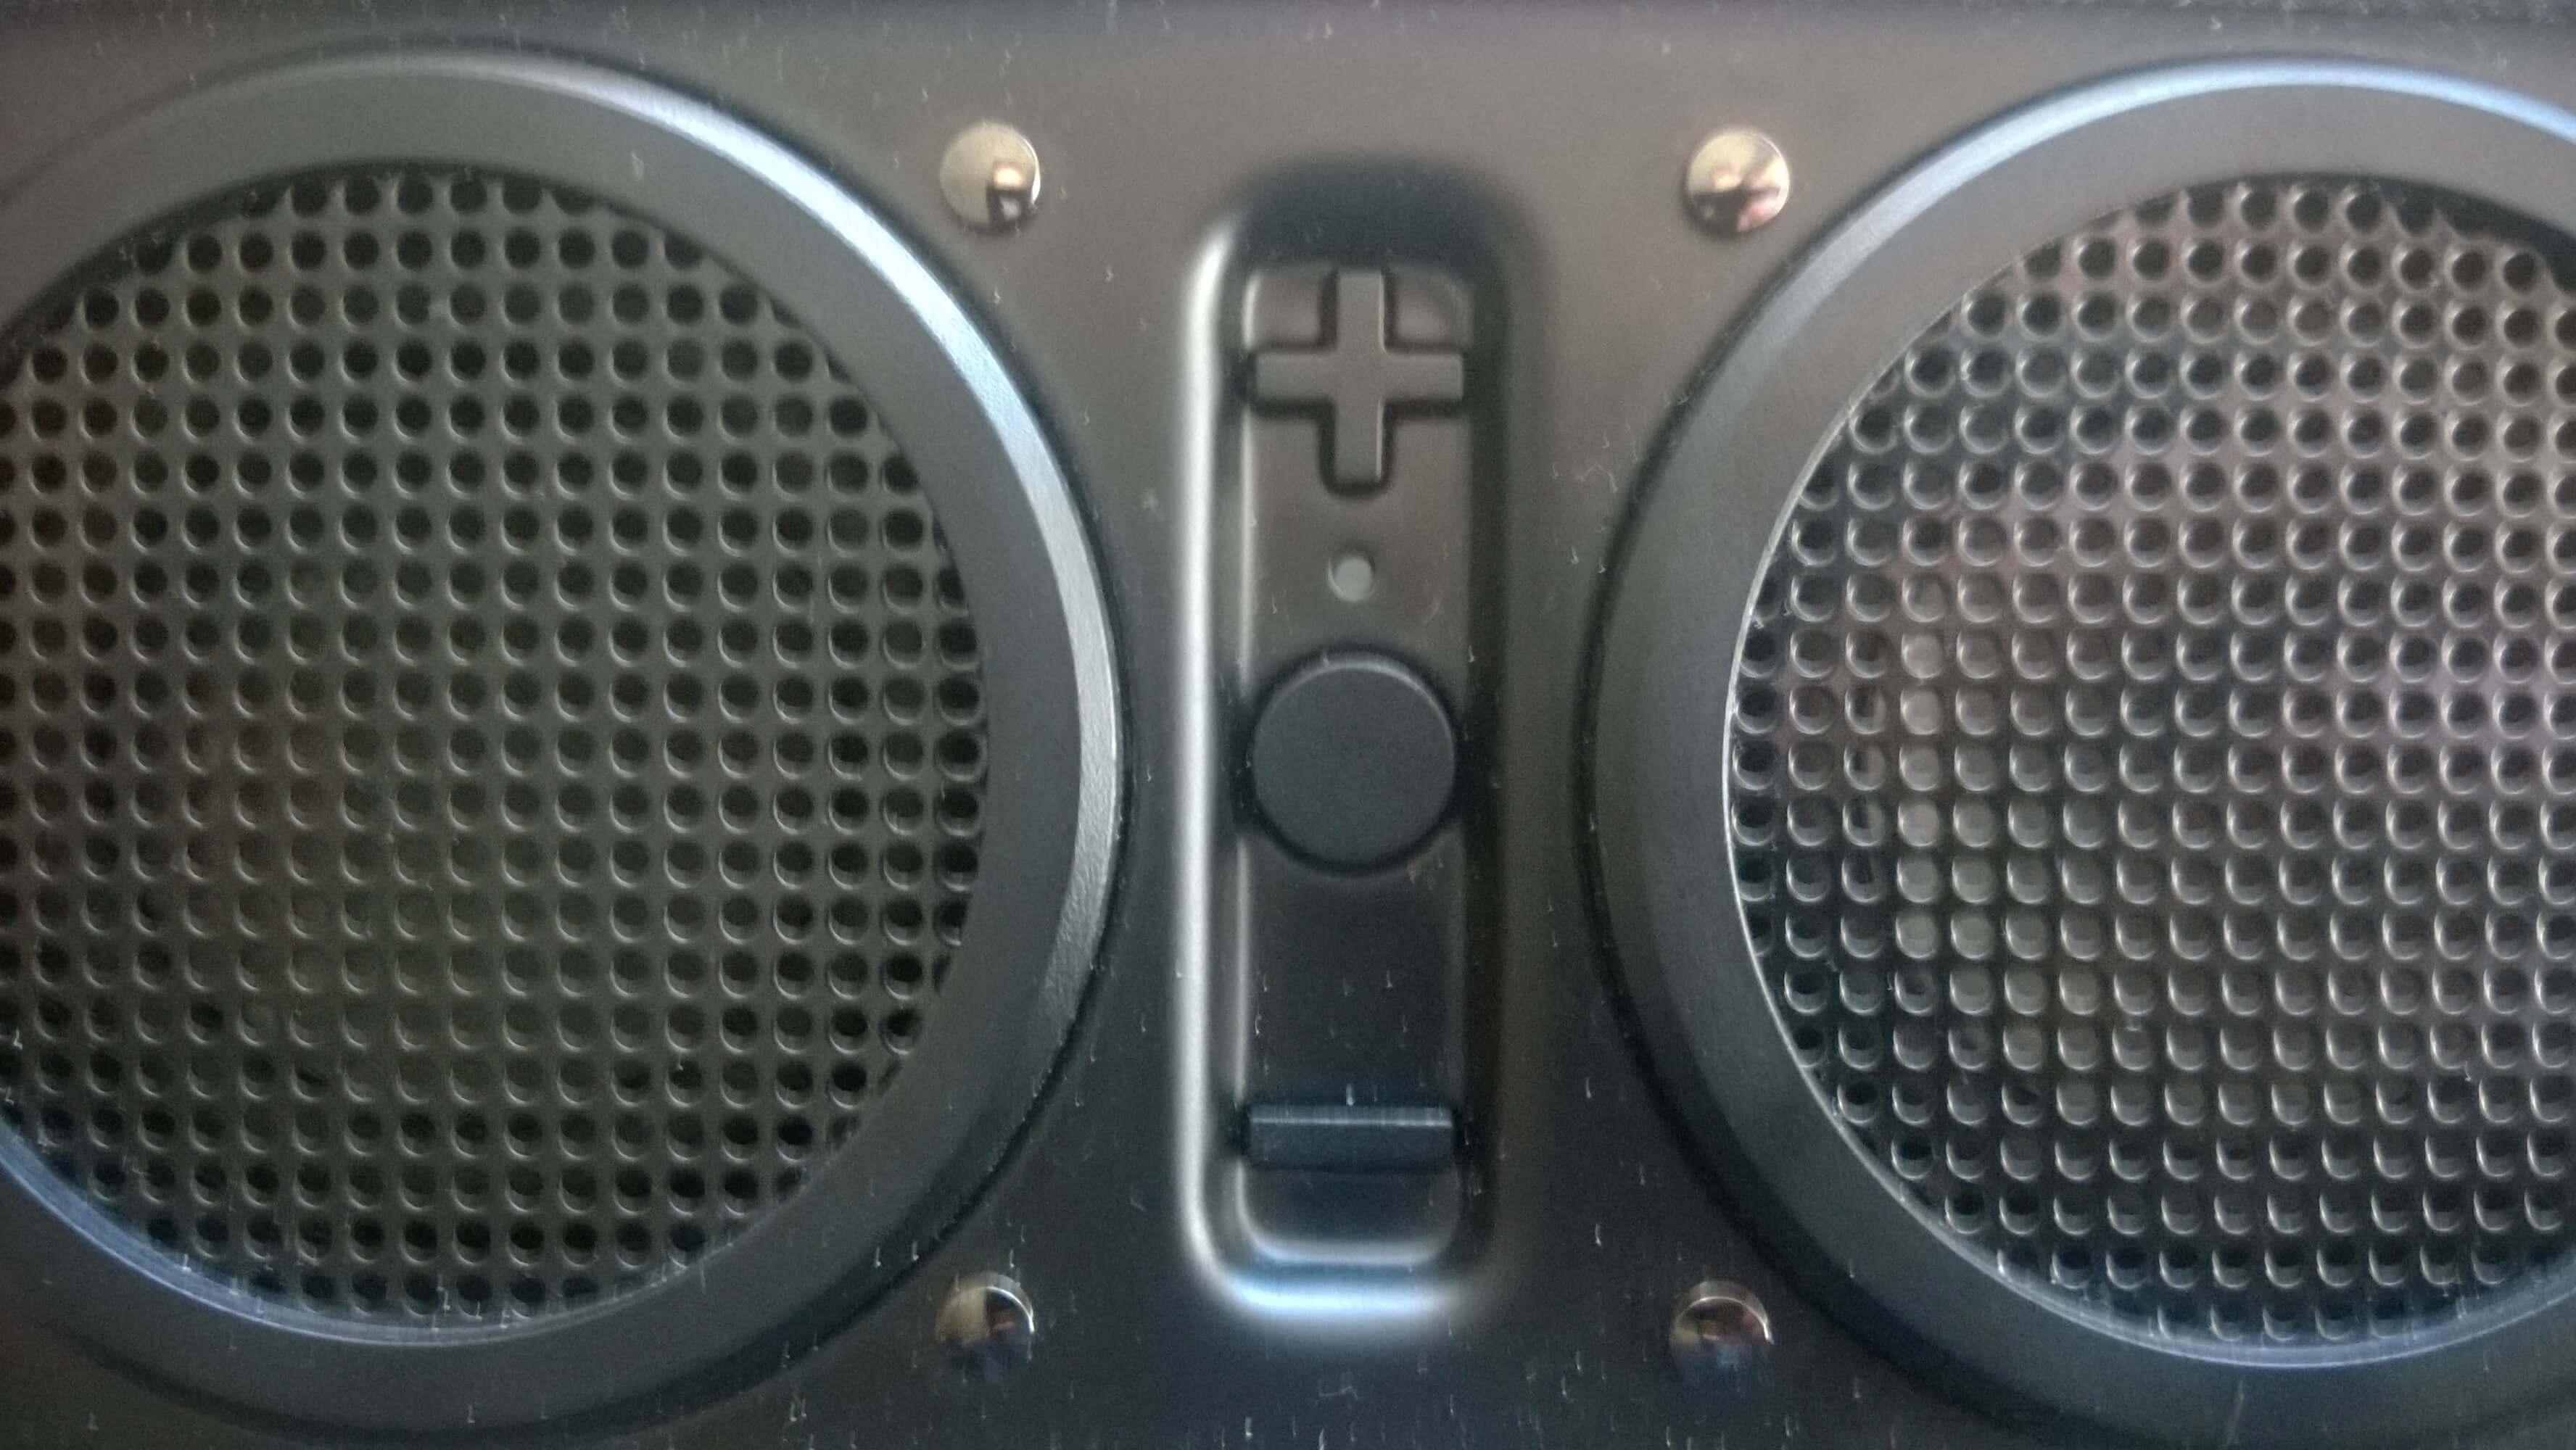 WP 20150309 009 - Review: Skullcandy's Air Raid Bluetooth Speaker